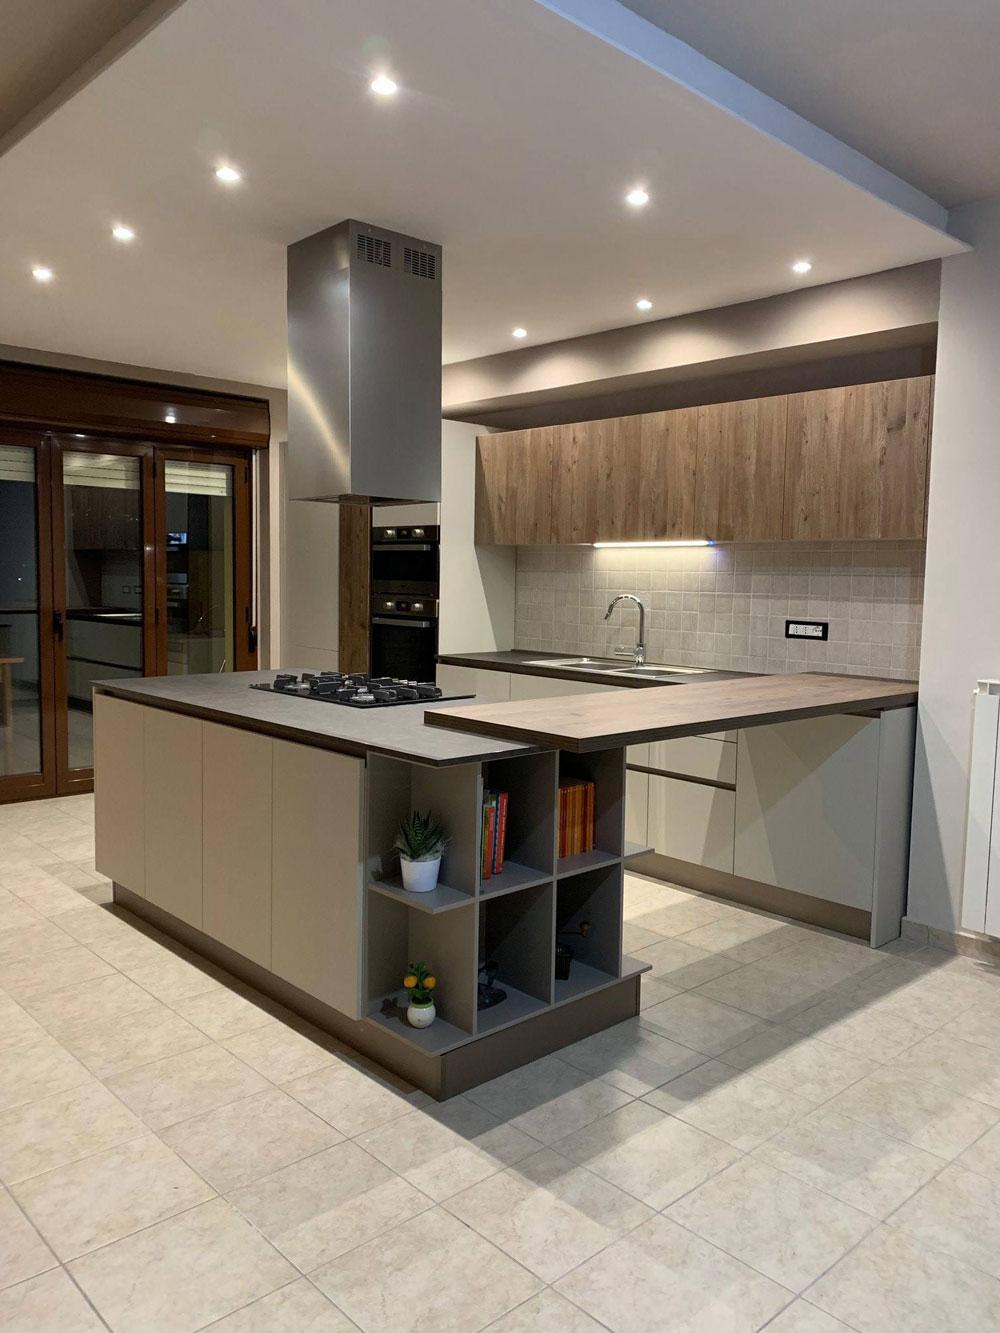 Cucina-Creo-Kitchens-Tablet-Personalizzata3.jpg